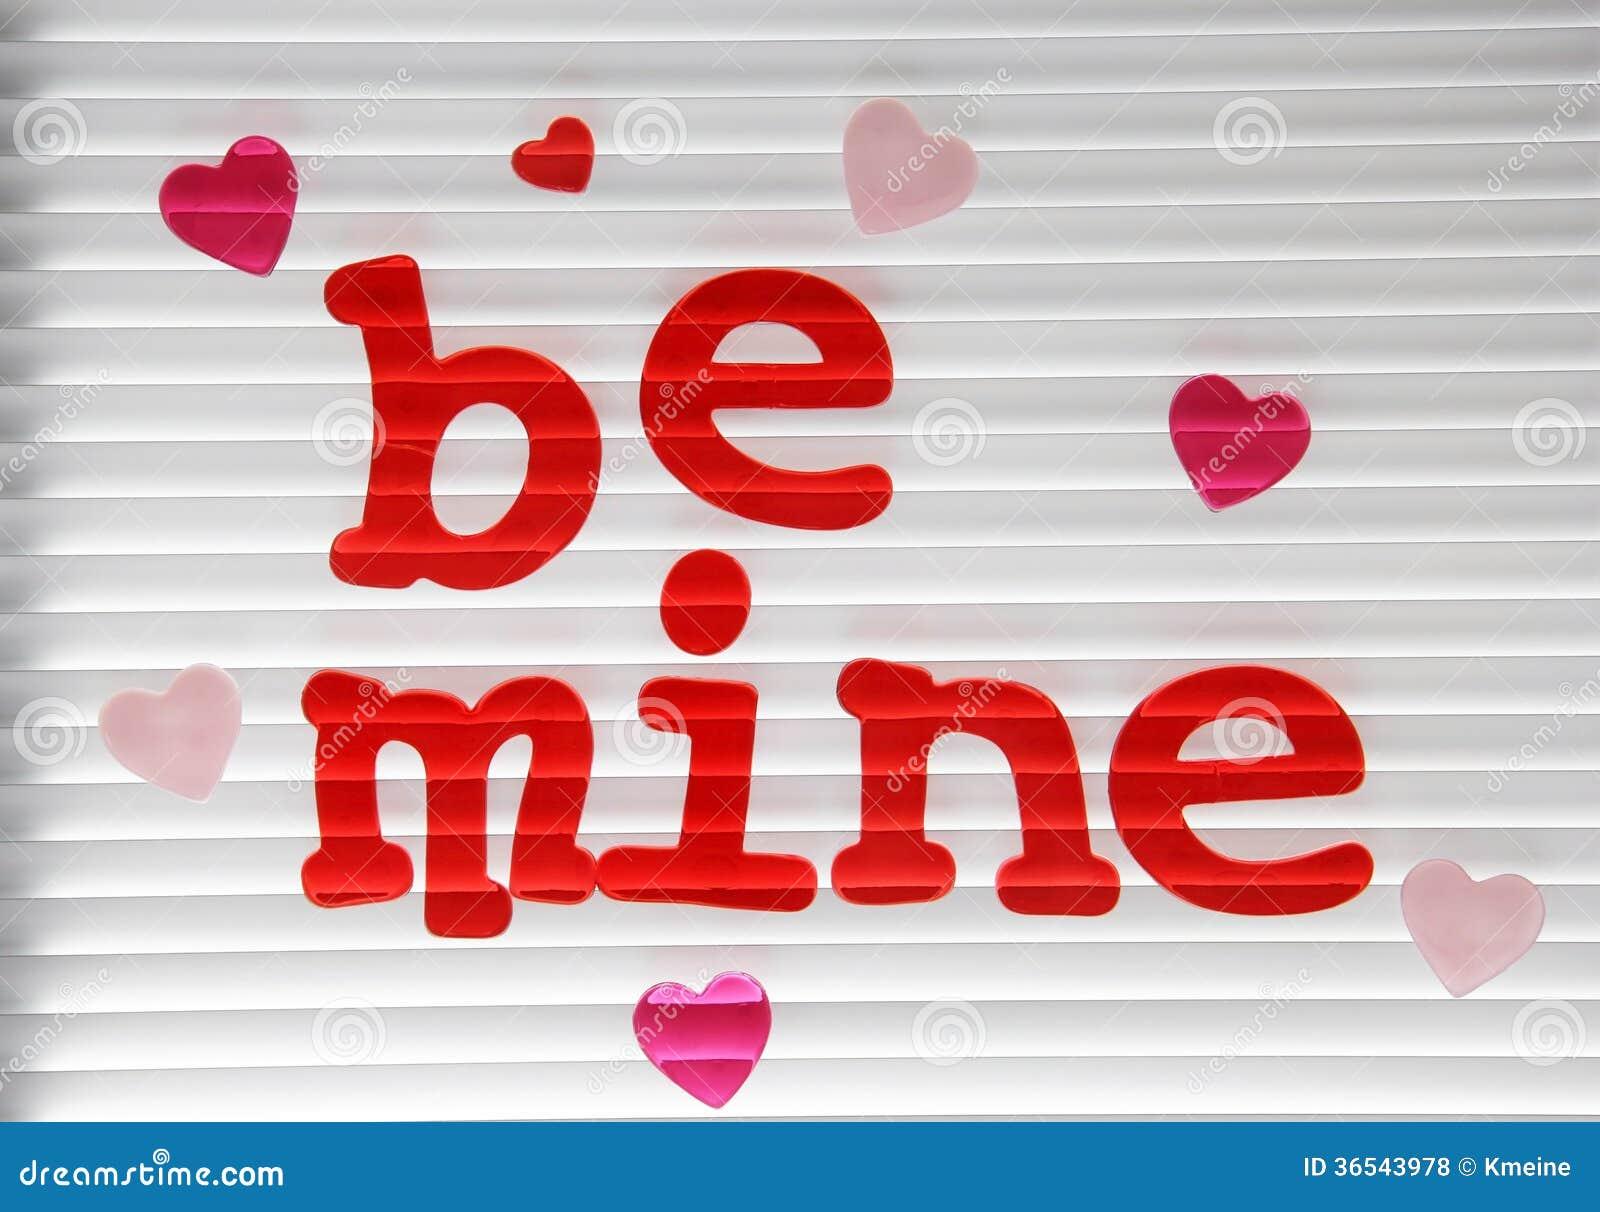 Be Mine Valentine Stuck On A Window